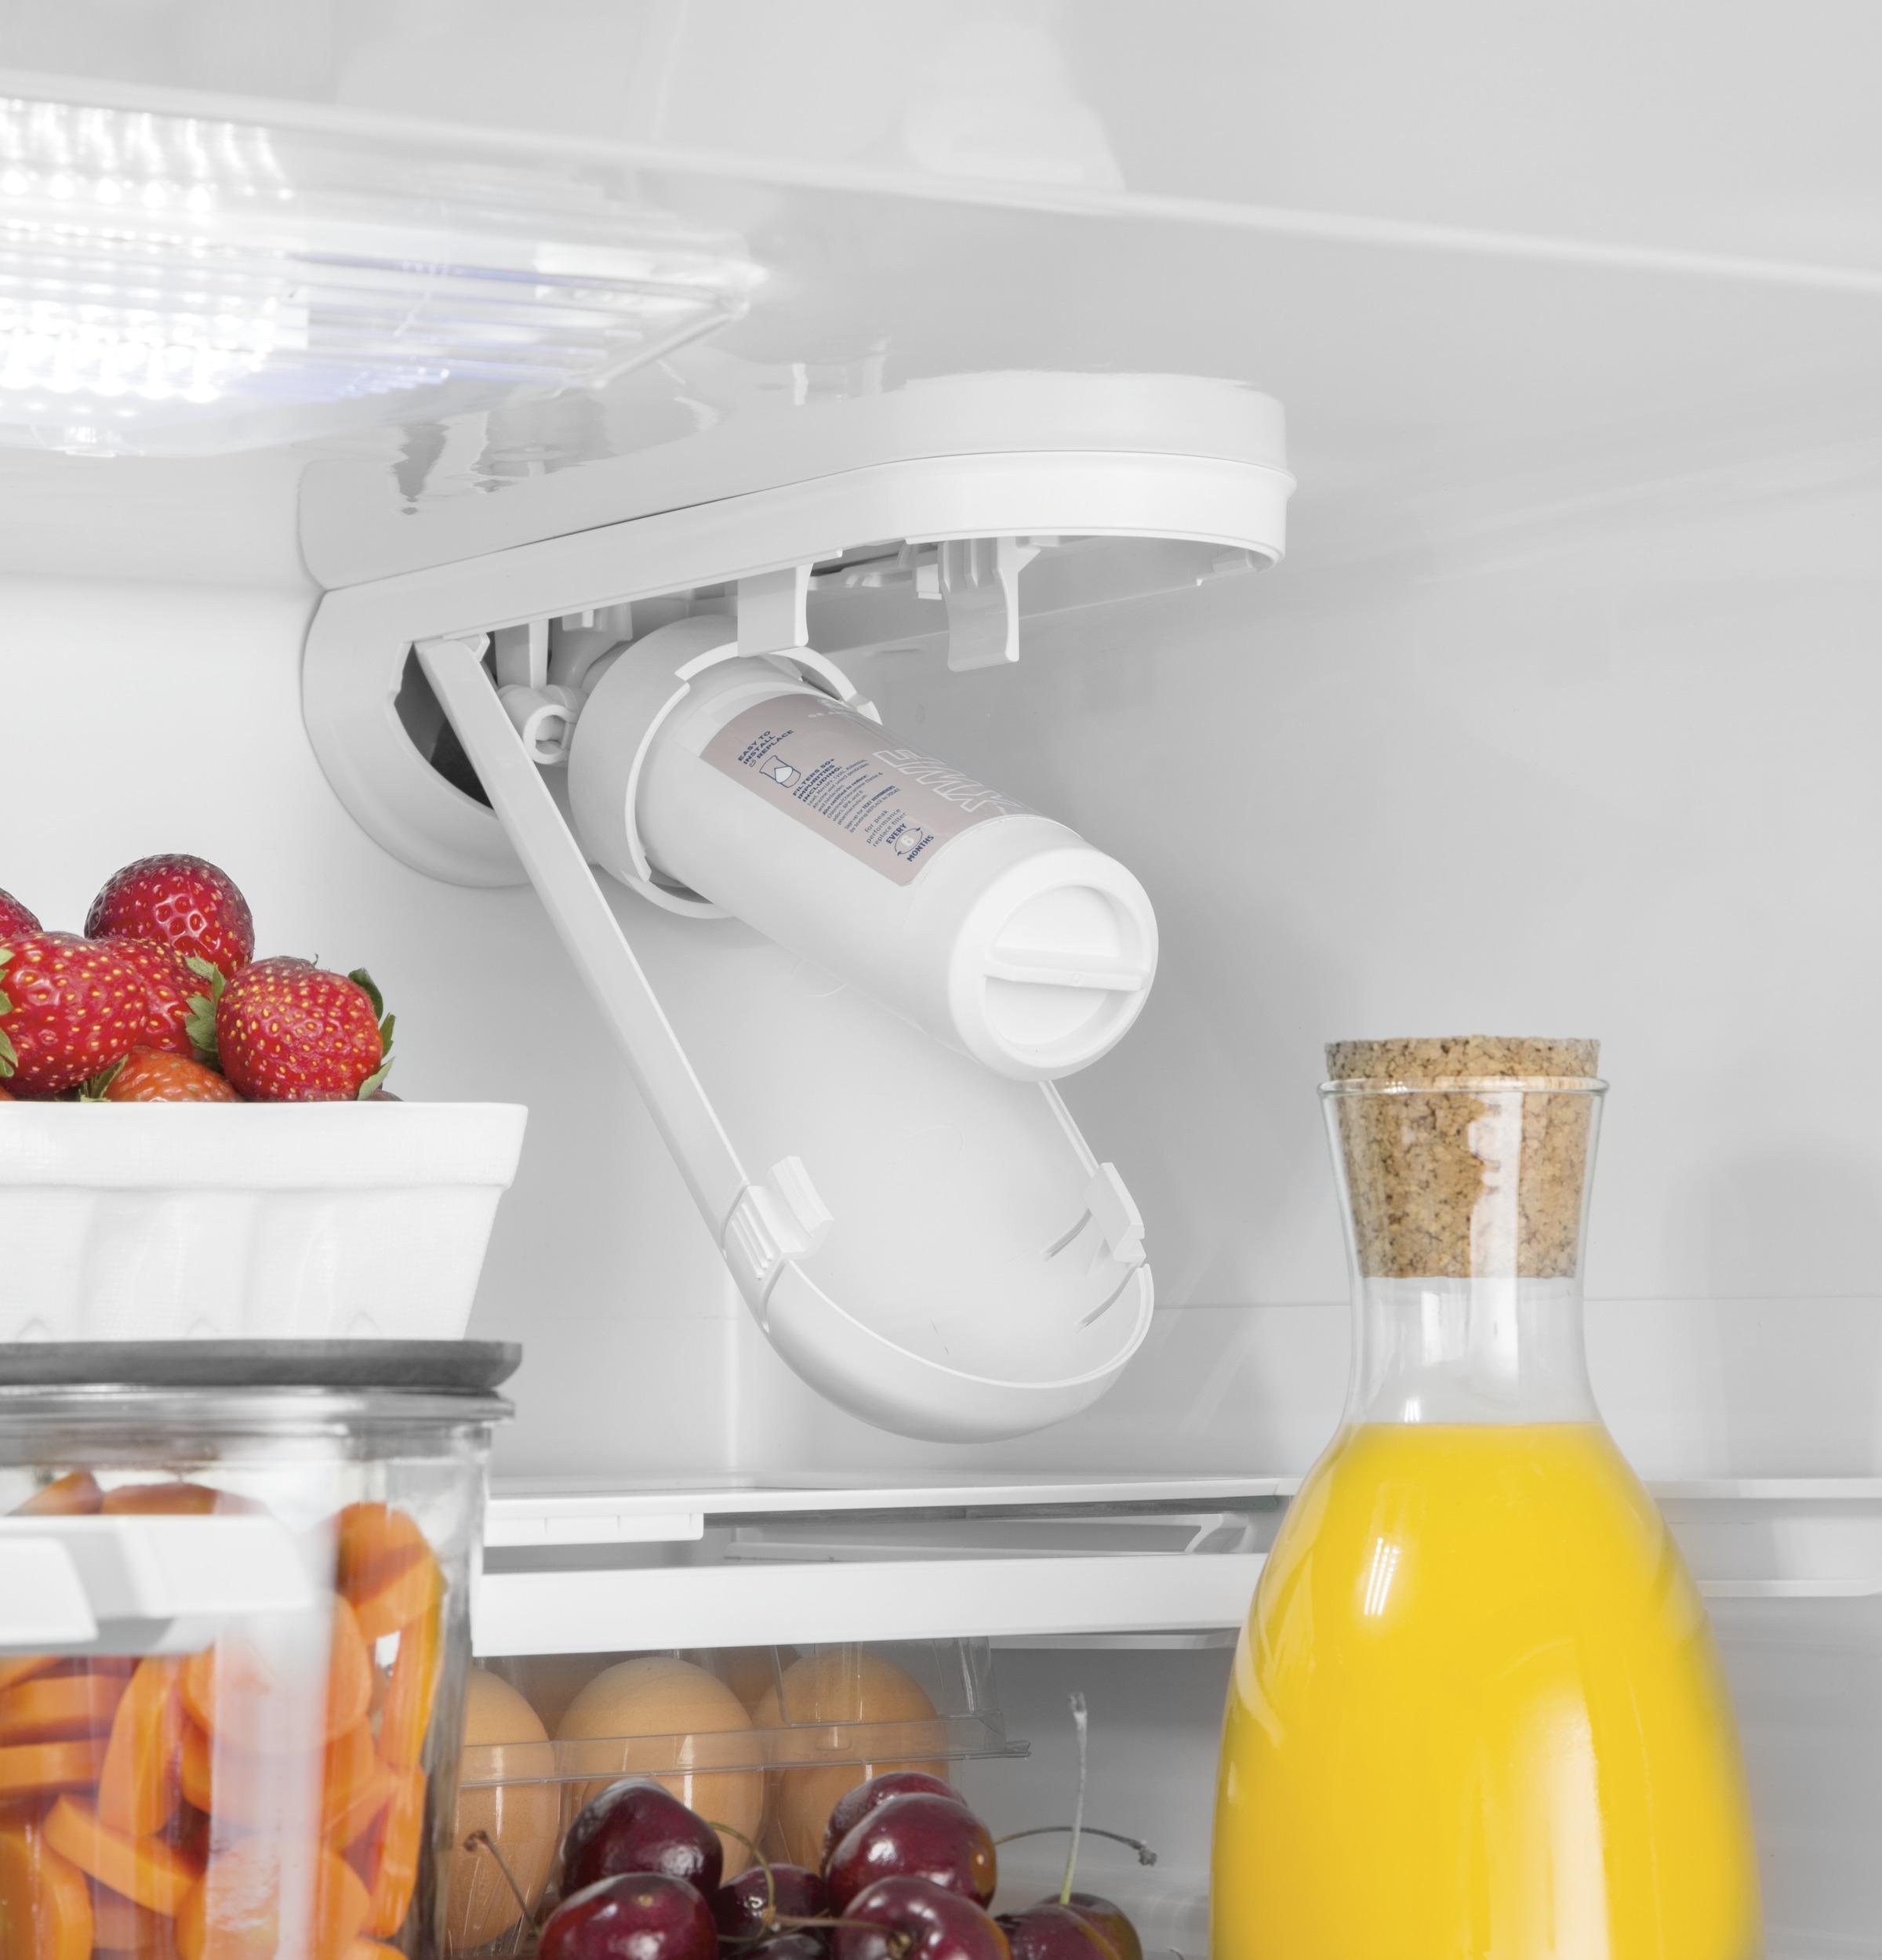 Model: GNE27JMMES | GE® ENERGY STAR® 27.0 Cu. Ft. French-Door Refrigerator